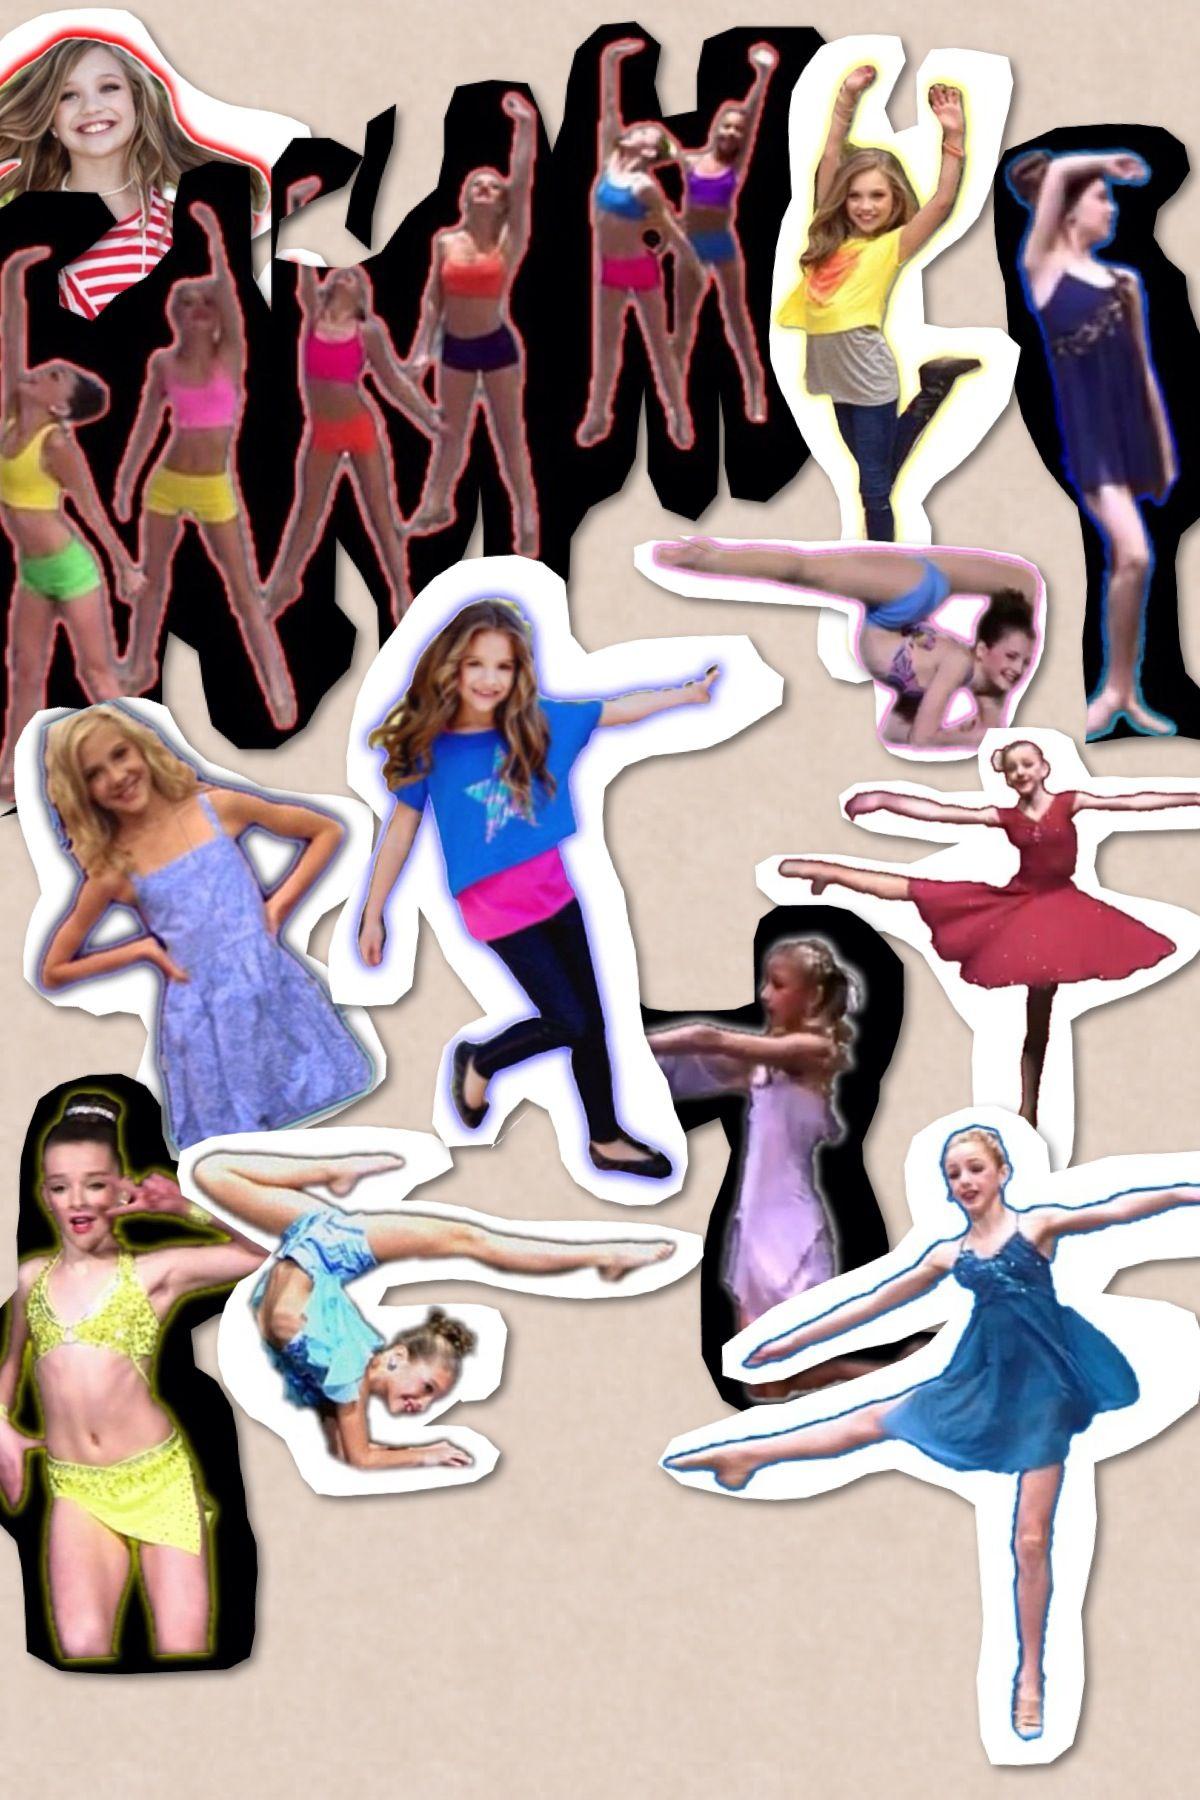 Dance moms edit